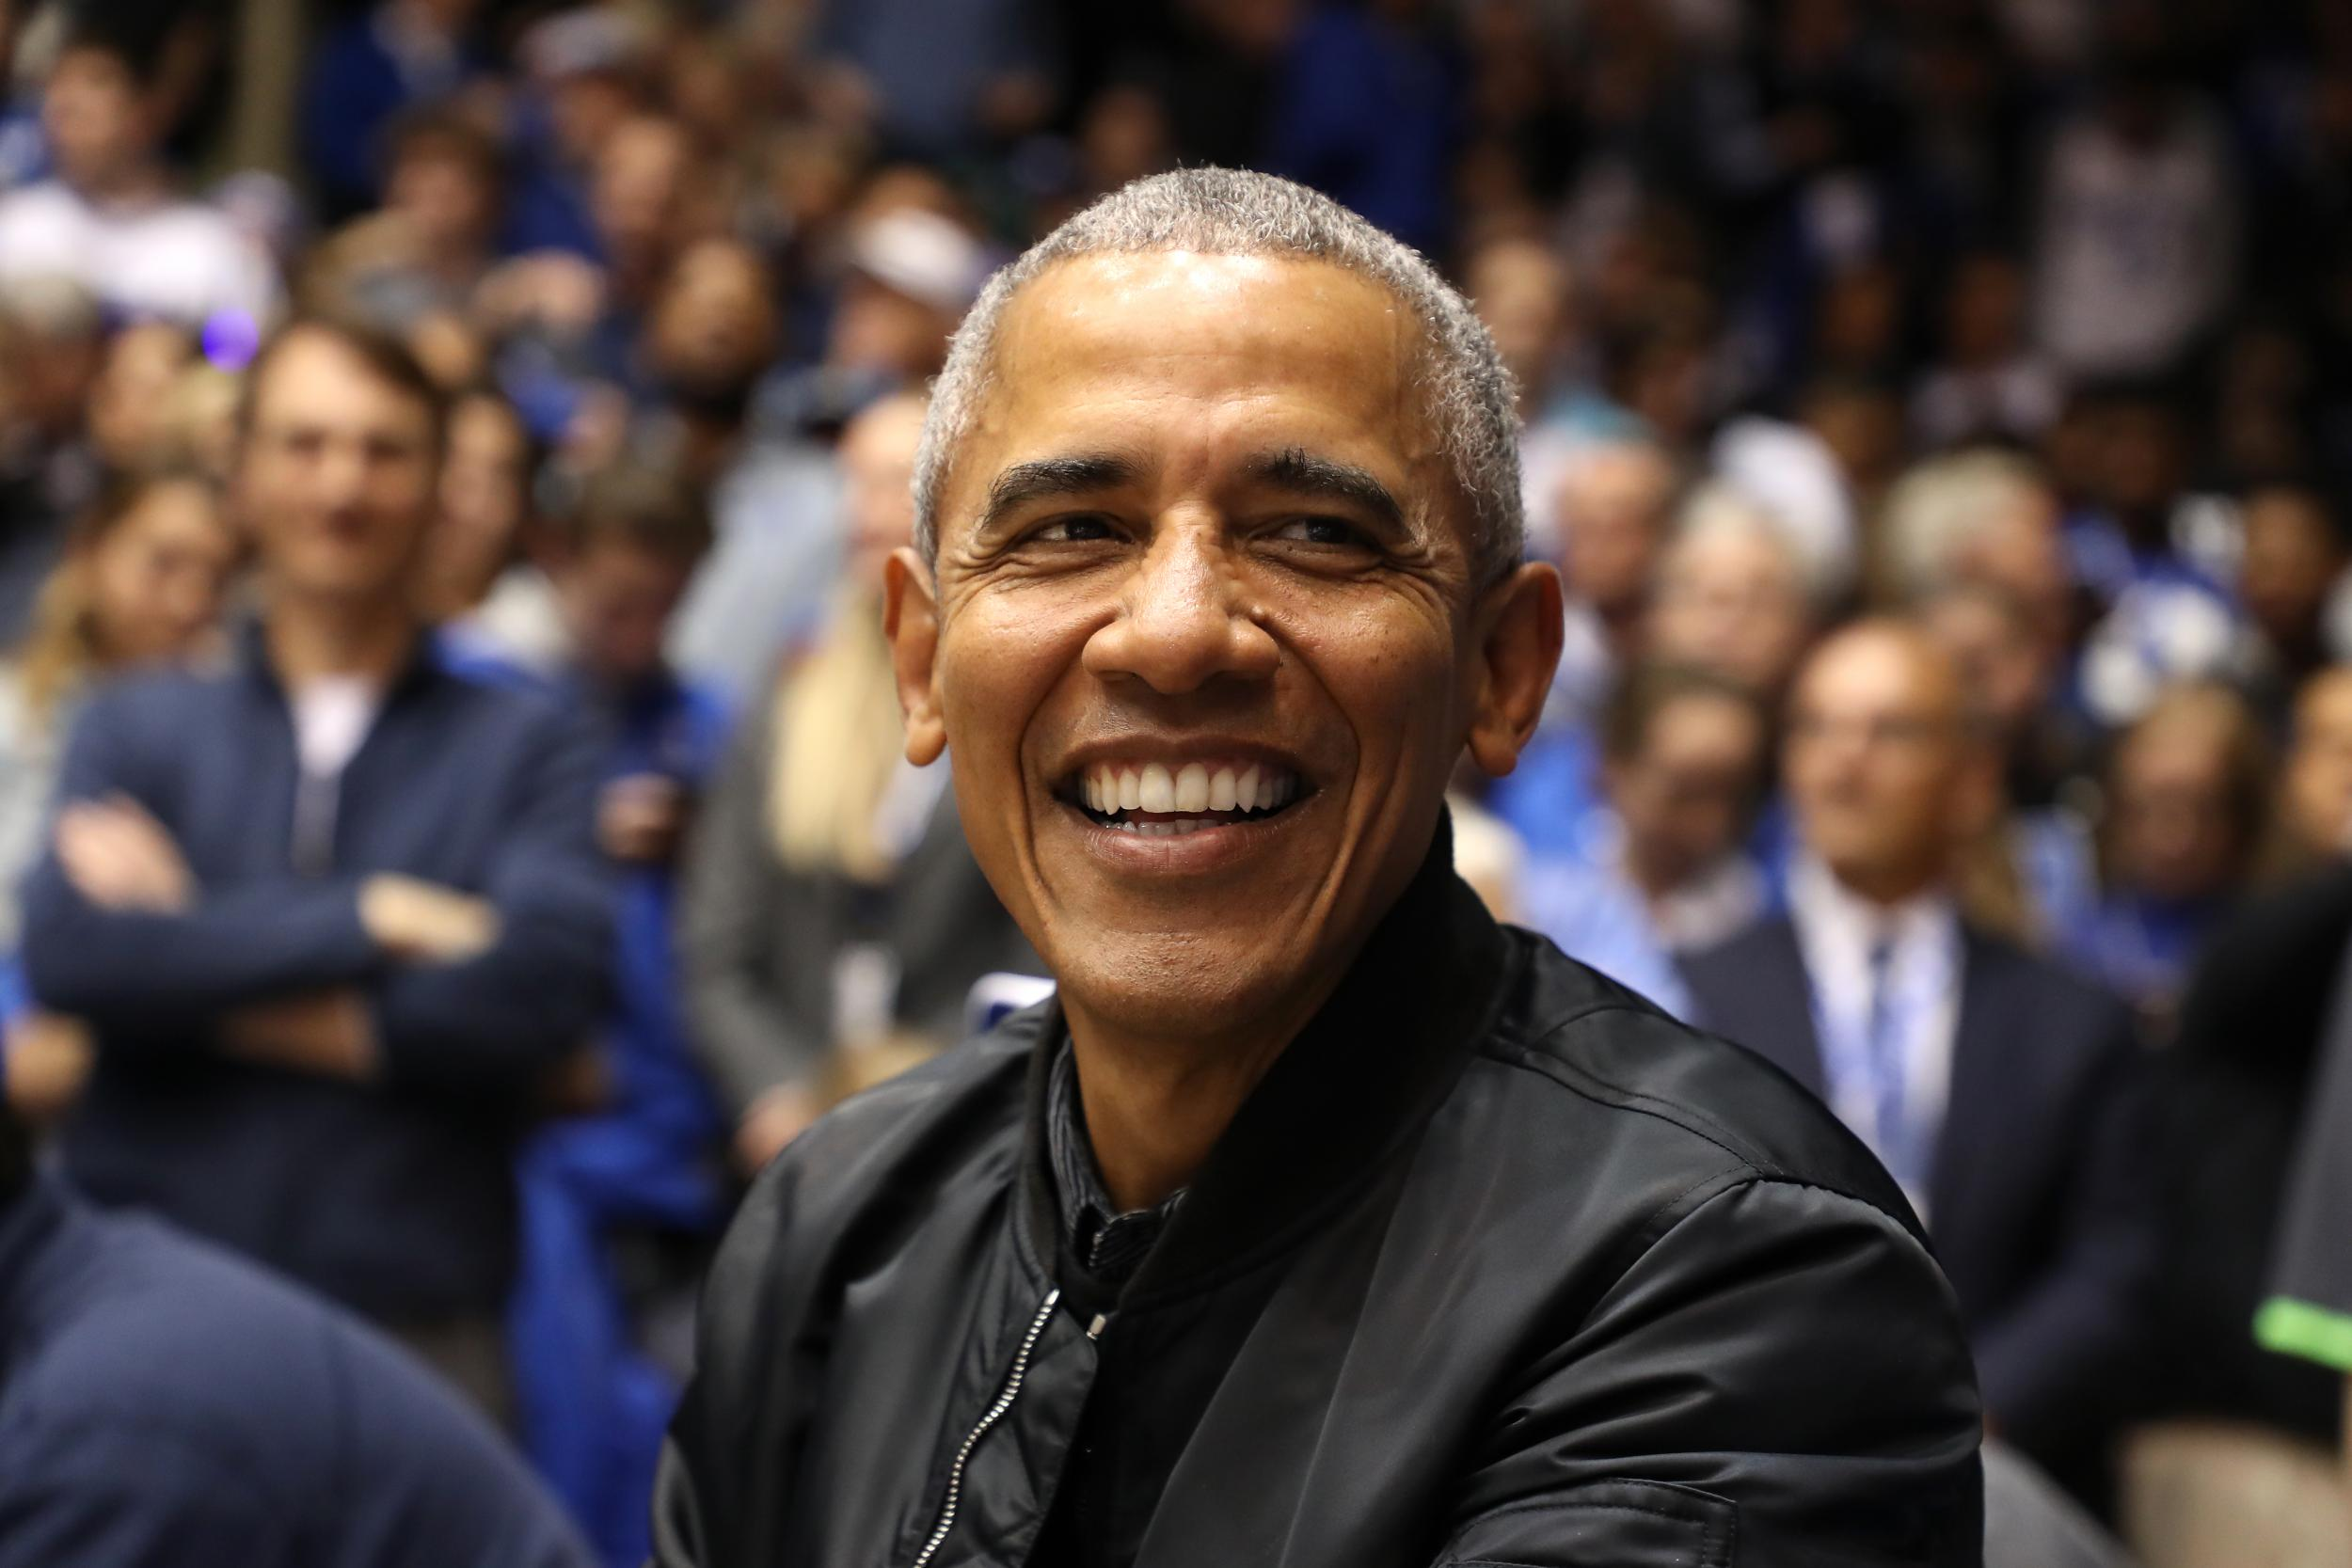 Barack Obama's 2019 summer reading list